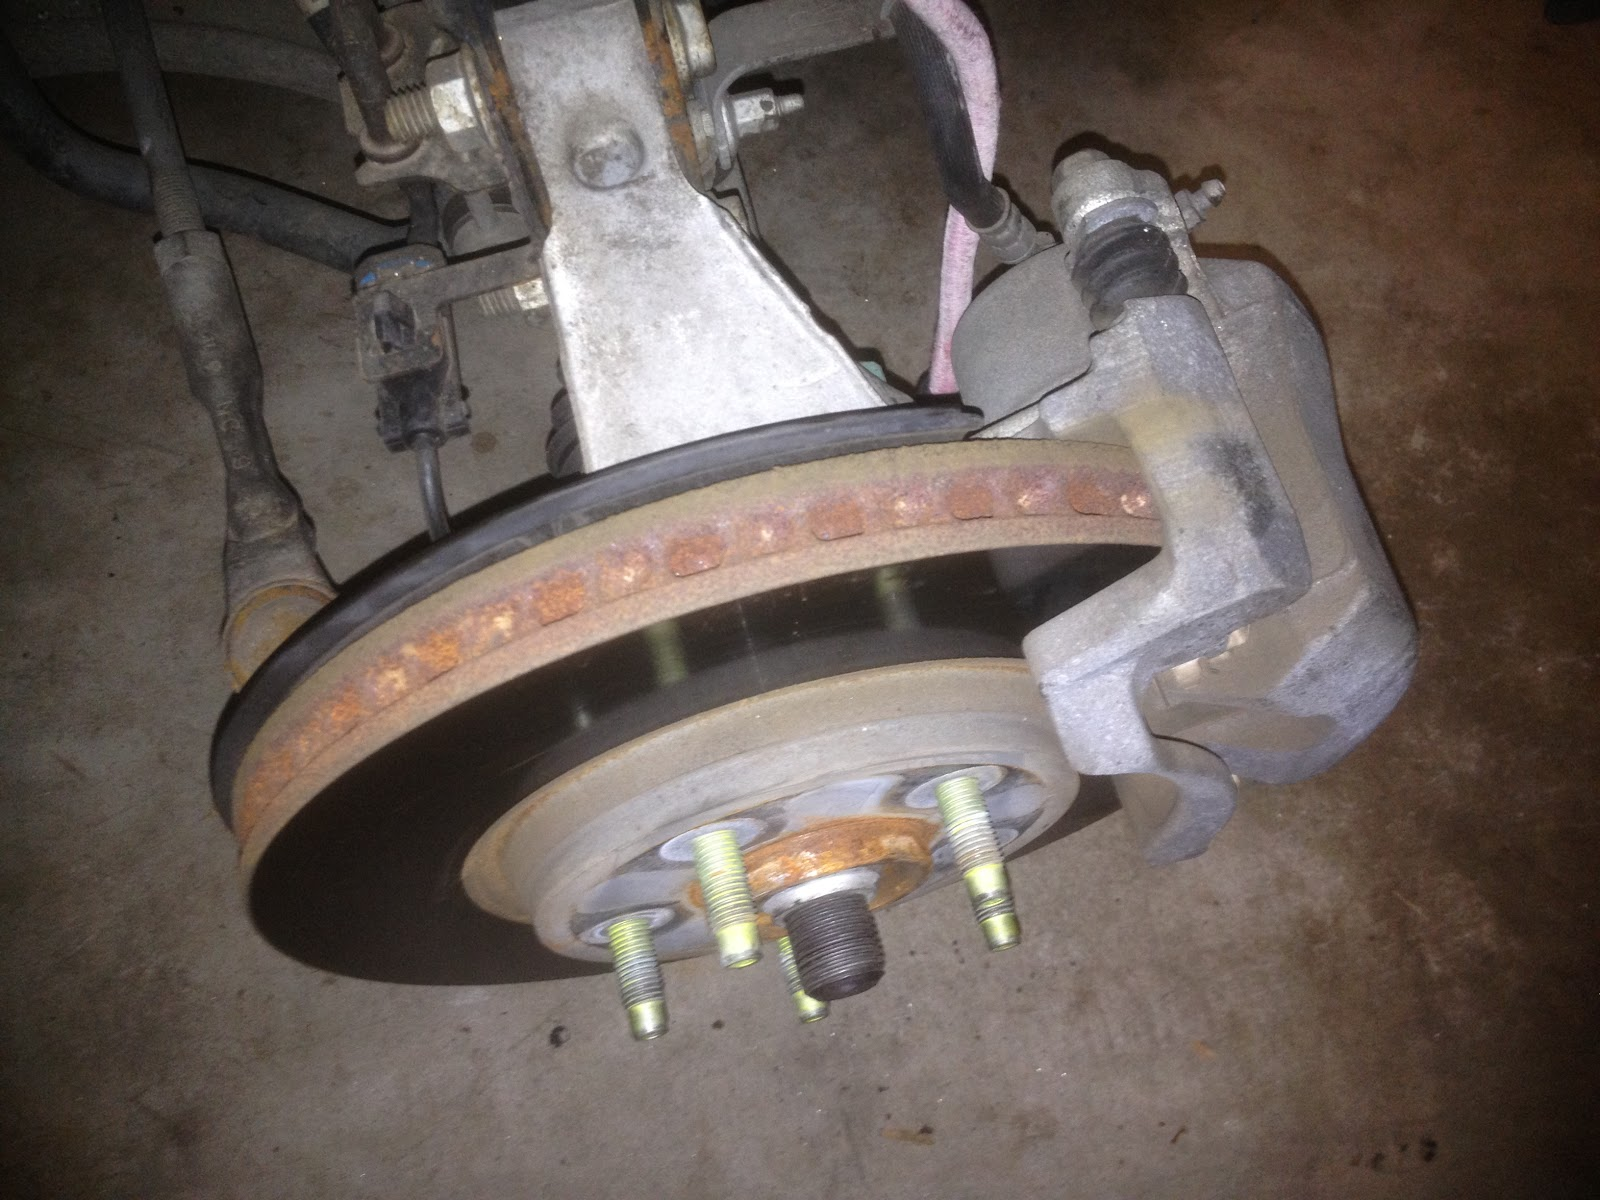 hight resolution of front brake job 2009 chevy malibu 2 4l